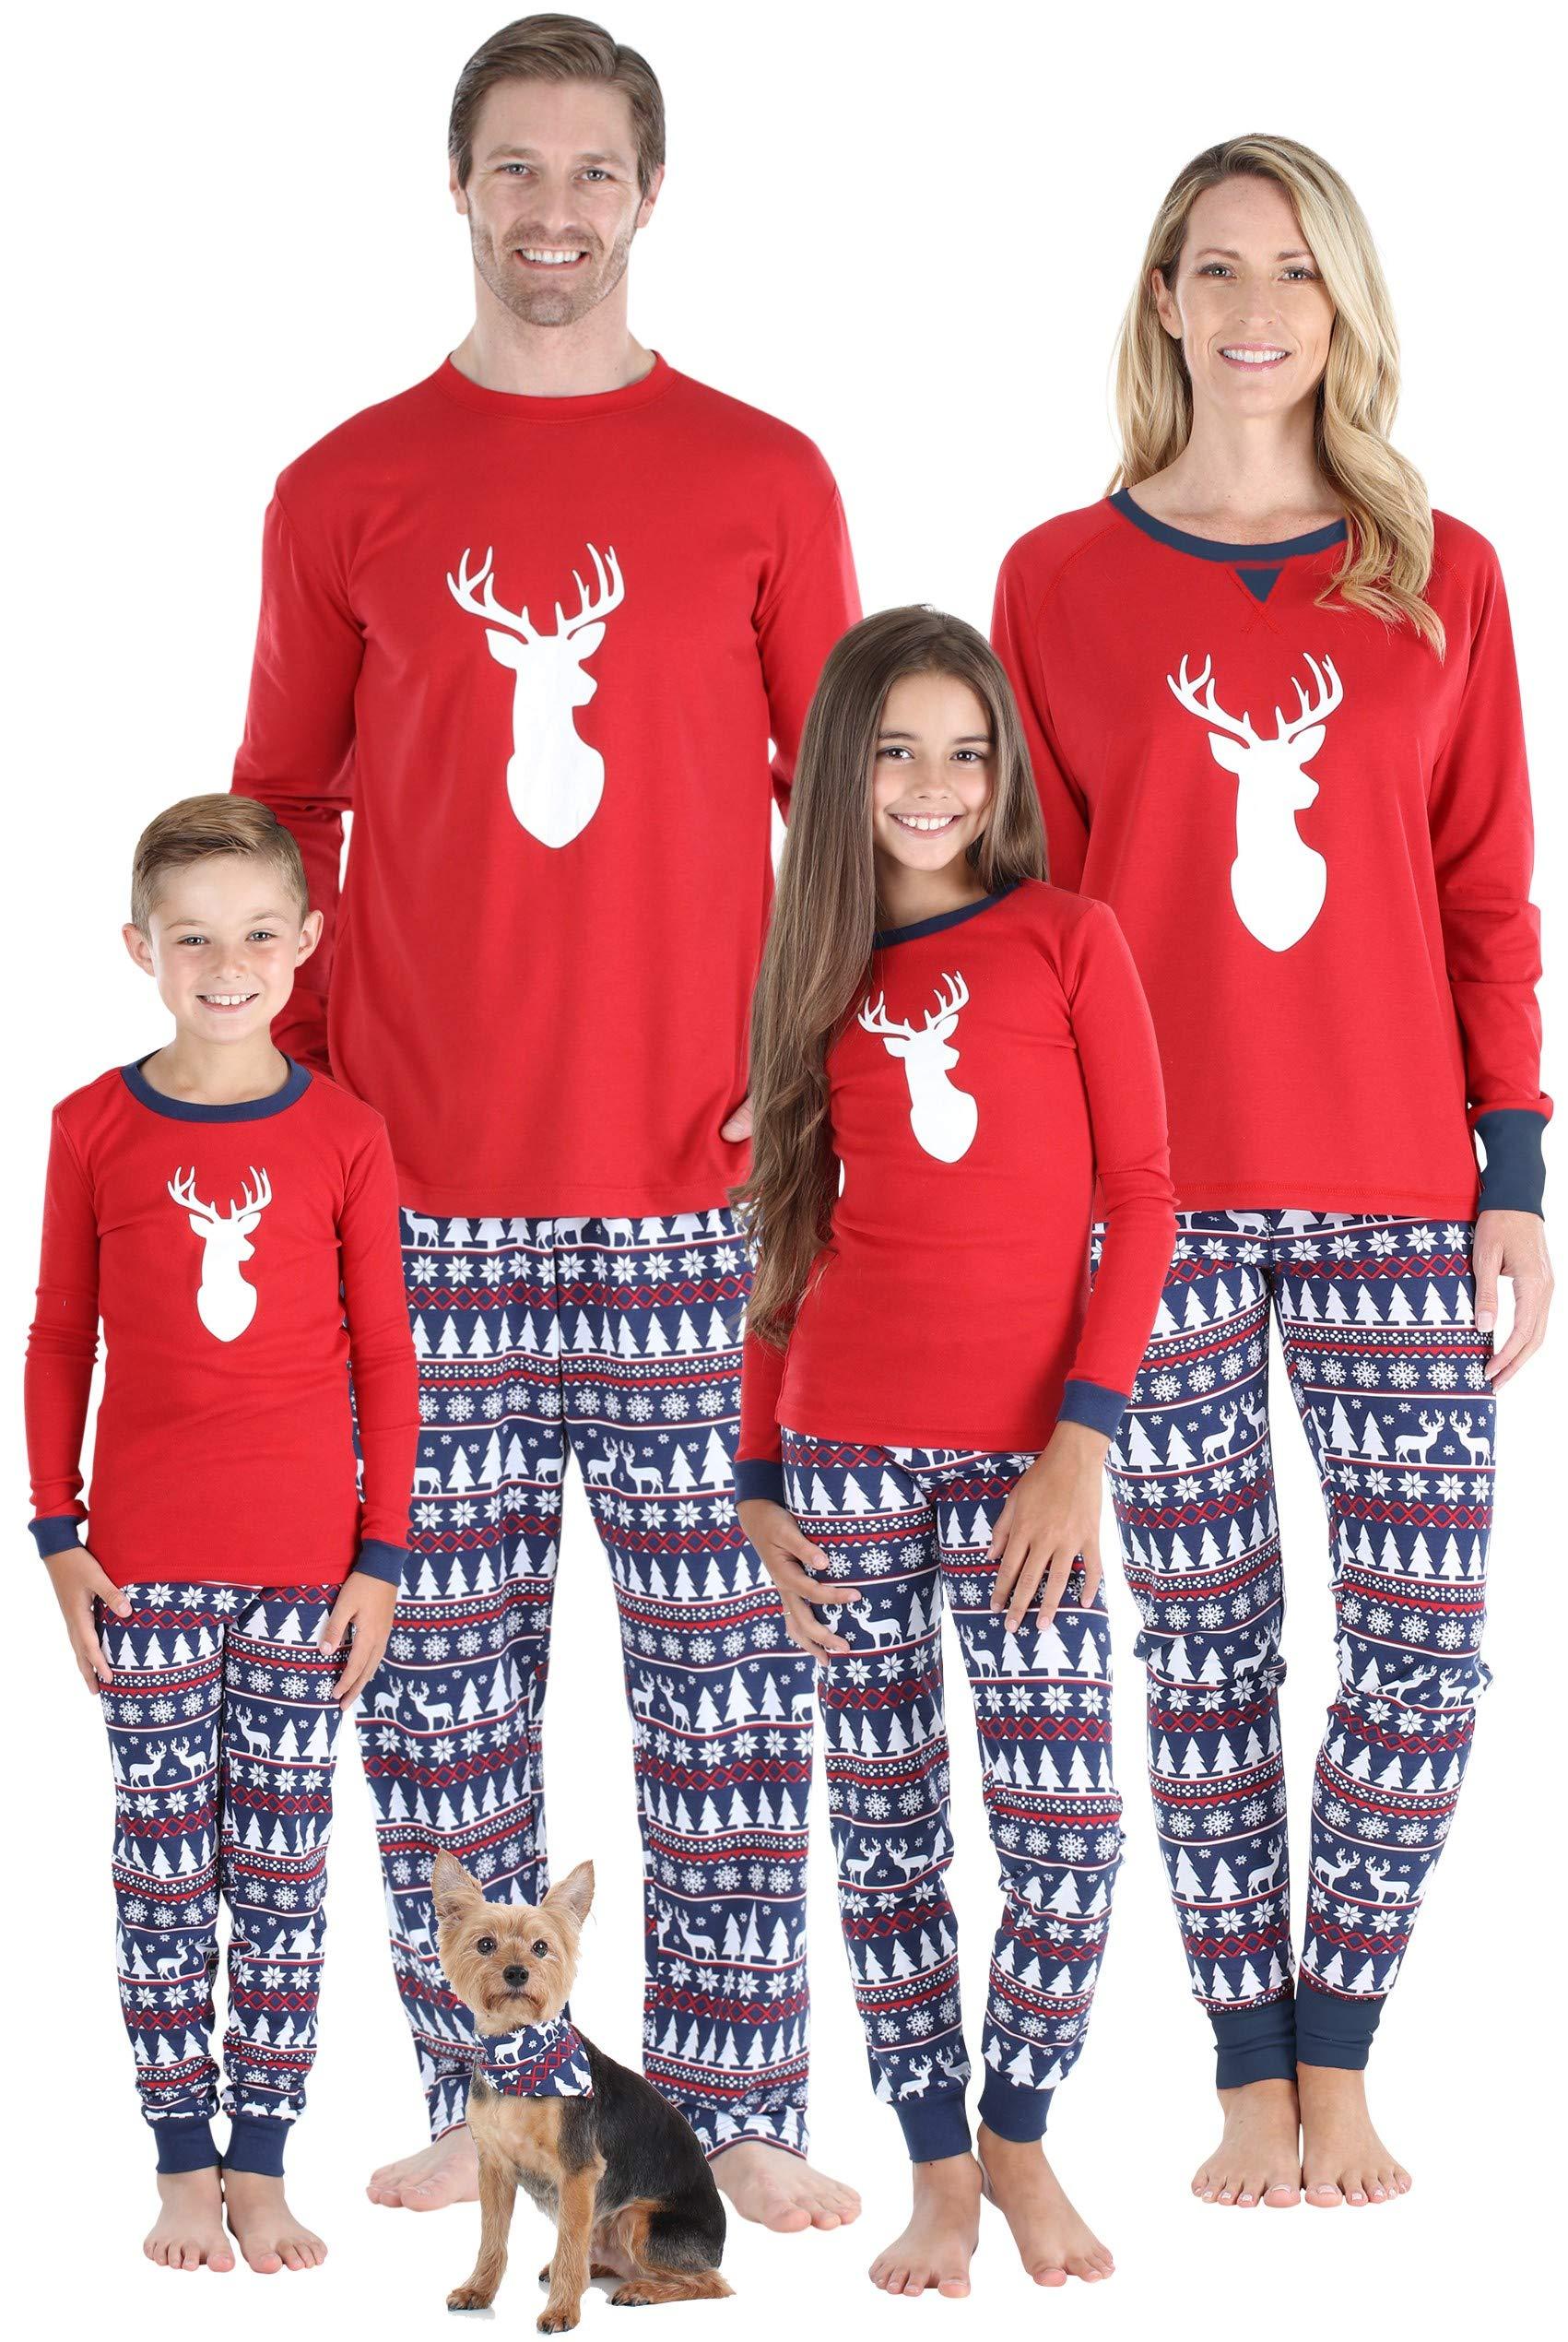 Sleepyheads Matching Family Christmas Pajama Sets, Red